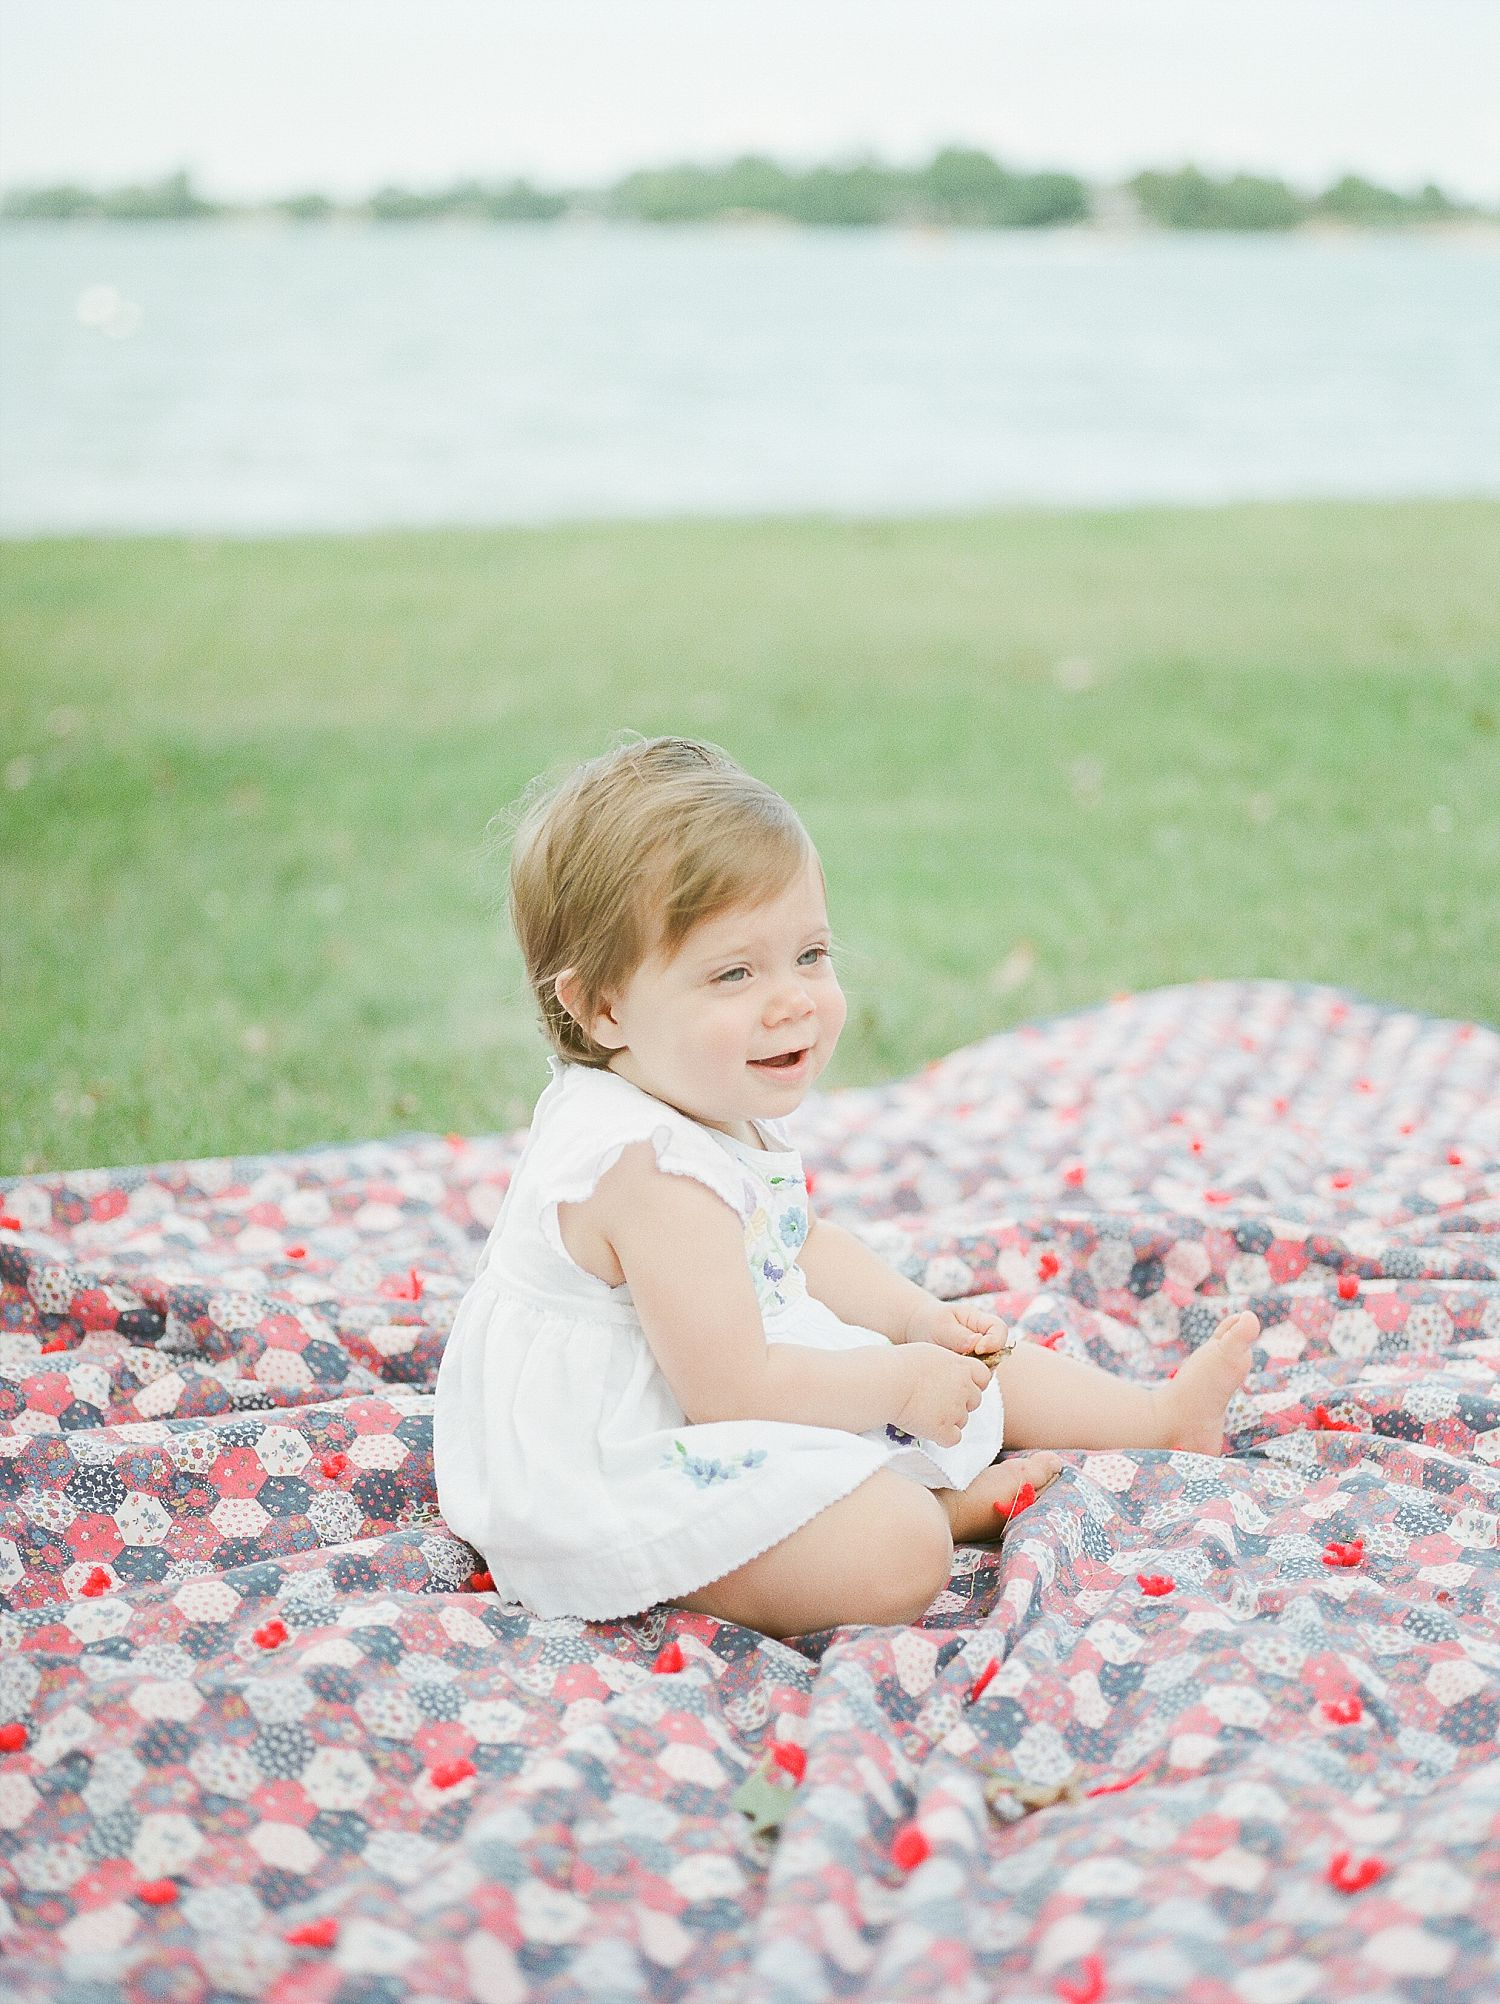 st-paul-mn-baby-photographer-allyson-wasmund-photography_0014.jpg